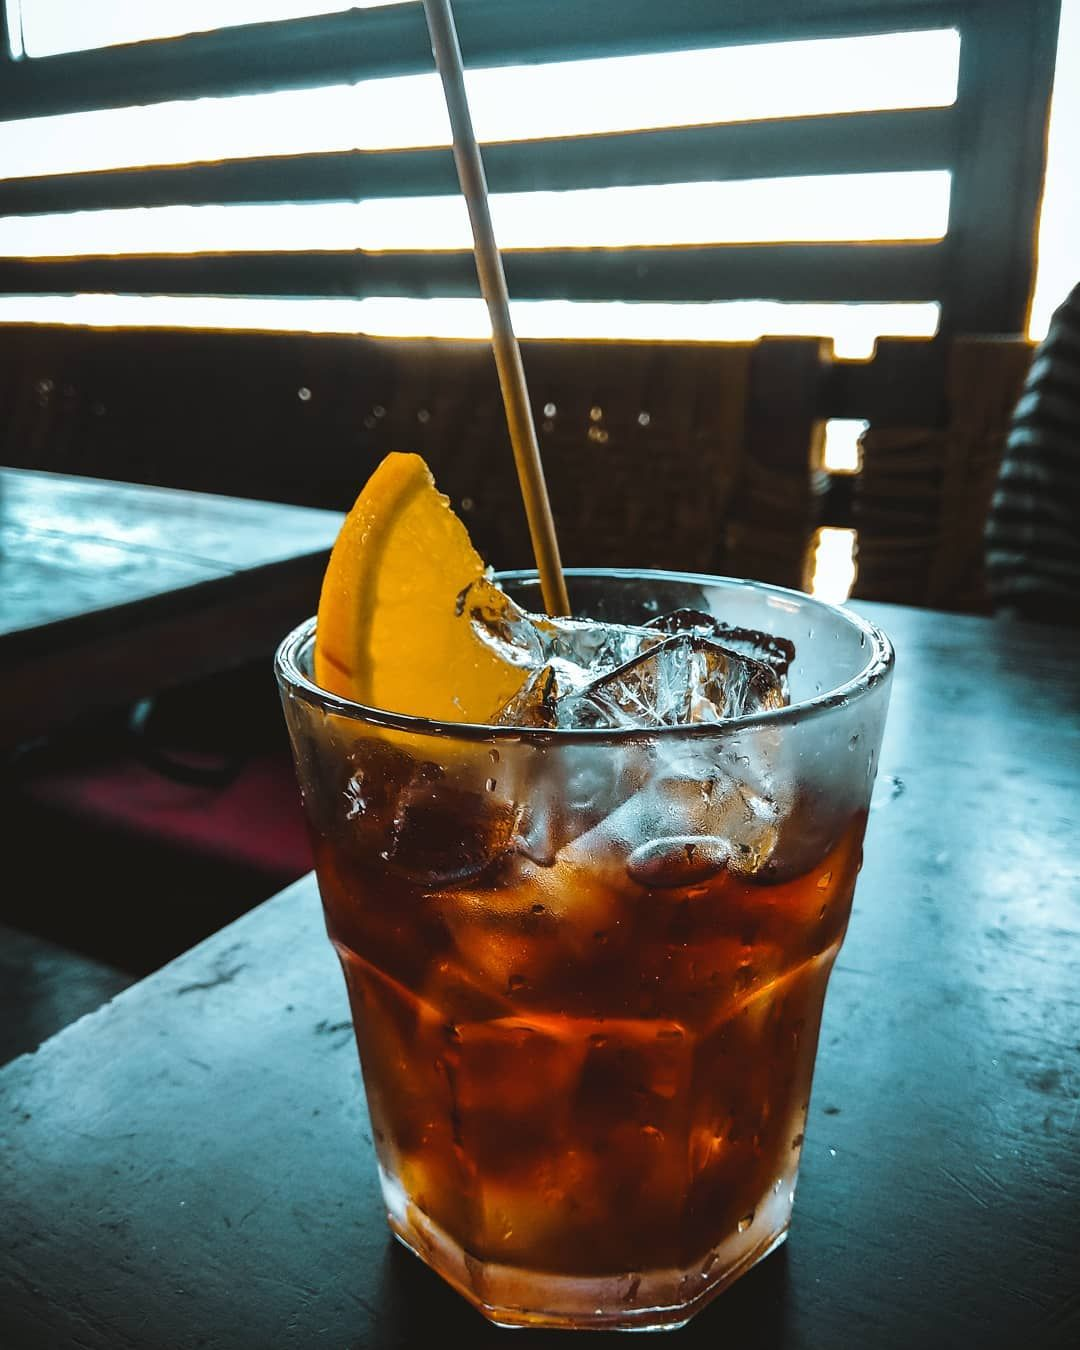 Old Fashioned Whisky 😍😋...Old Fashioned Whisky 😍😋  •  •  •  Use #foodzone98 to get featured💯  •  •  #mumbaifoodie #mumbaicafe #mumbaifoodblogger #foodlover #love #foodiegram #summerseason #curlytales #cocktailsofinstagram #foodphotography #foodiesofinstagram #mumbaistreetfood #whisky #pizzawali #cocktails #cafeinteriors #mumbaifoodicious #foodtalkmumbai #mumbaidiaries #punefood #punefoodies #punefoodlovers #northindianfood #foodtalkindia #foodgasmic #foodiegram